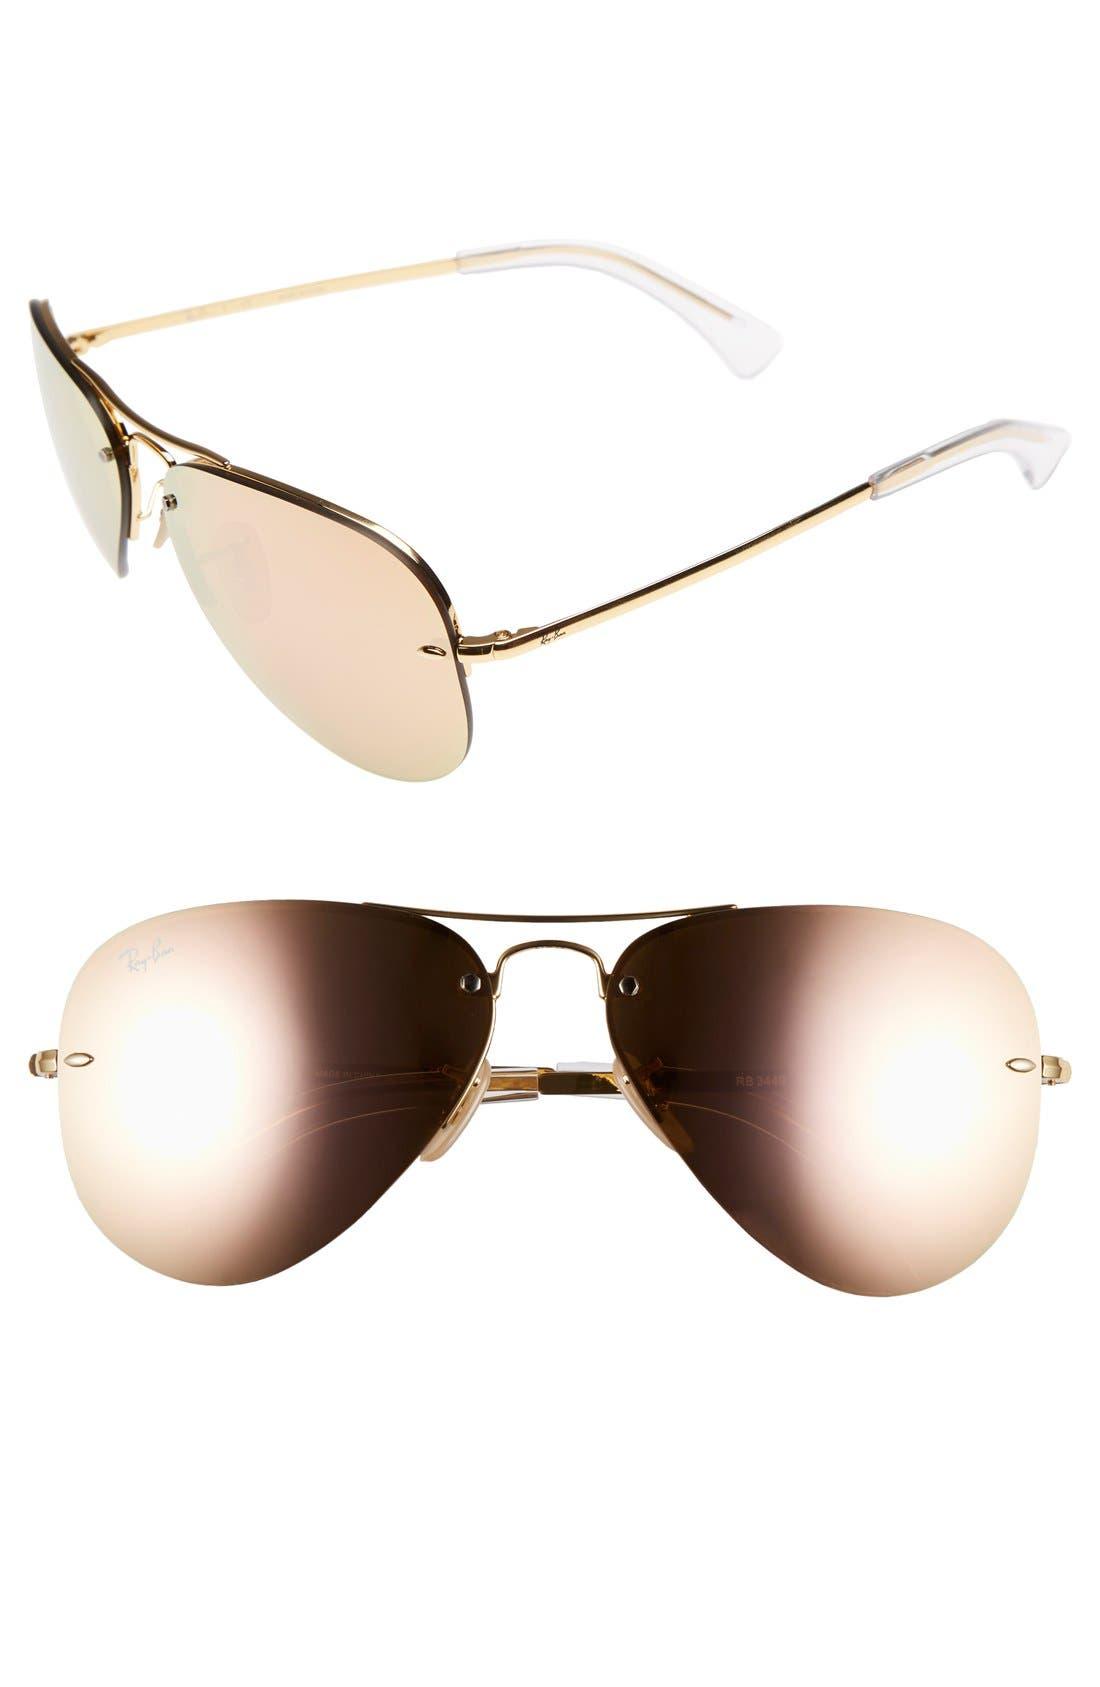 Highstreet 59mm Semi Rimless Aviator Sunglasses,                             Main thumbnail 1, color,                             BROWN/ PINK